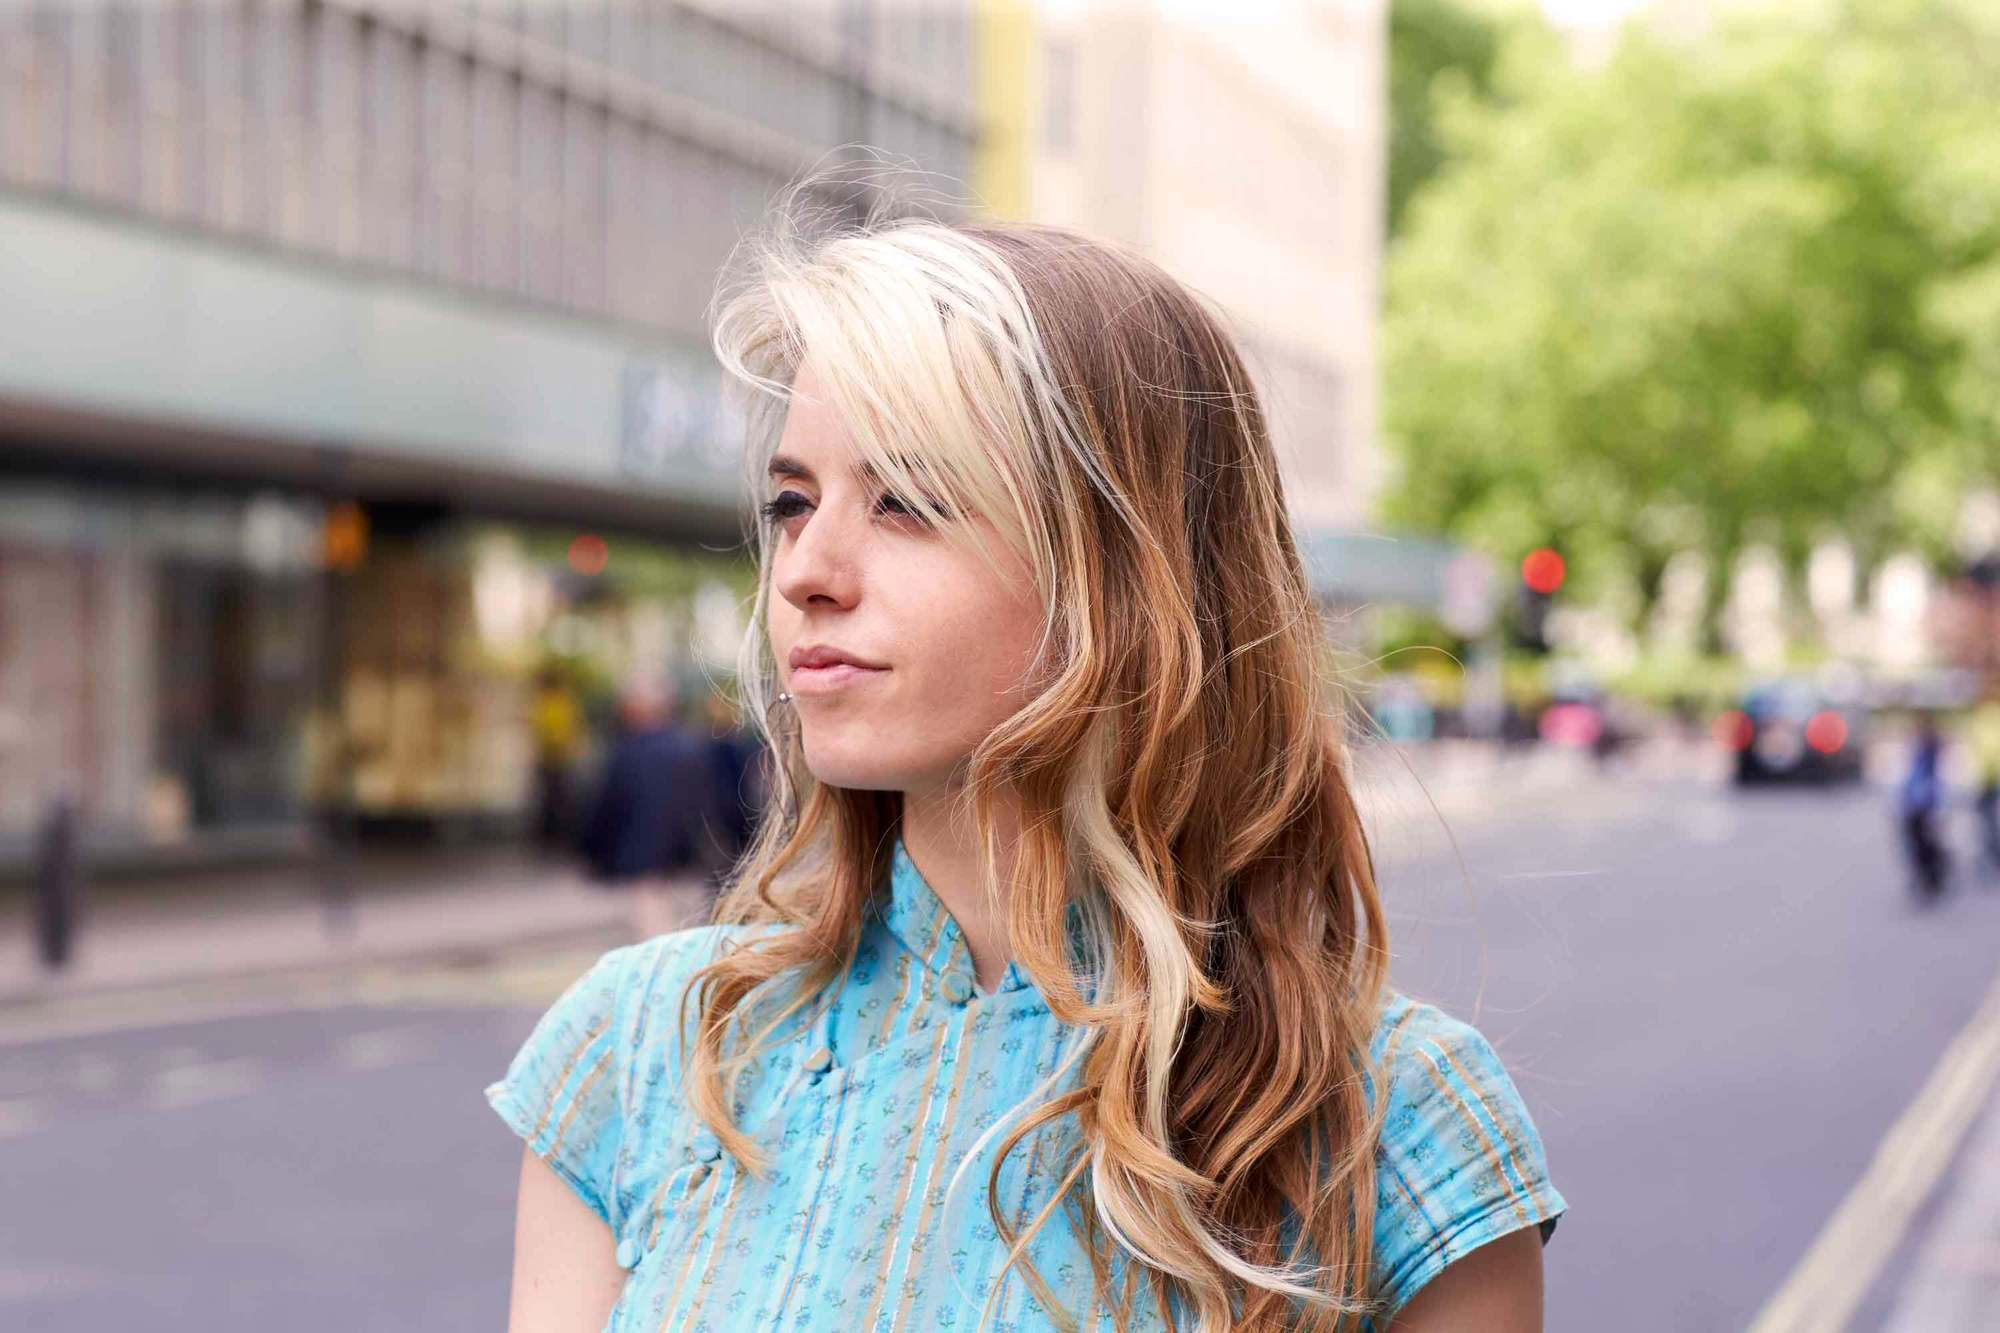 Hair Streaks 20 Updated Ways To Wear This Trend All Things Hair Us